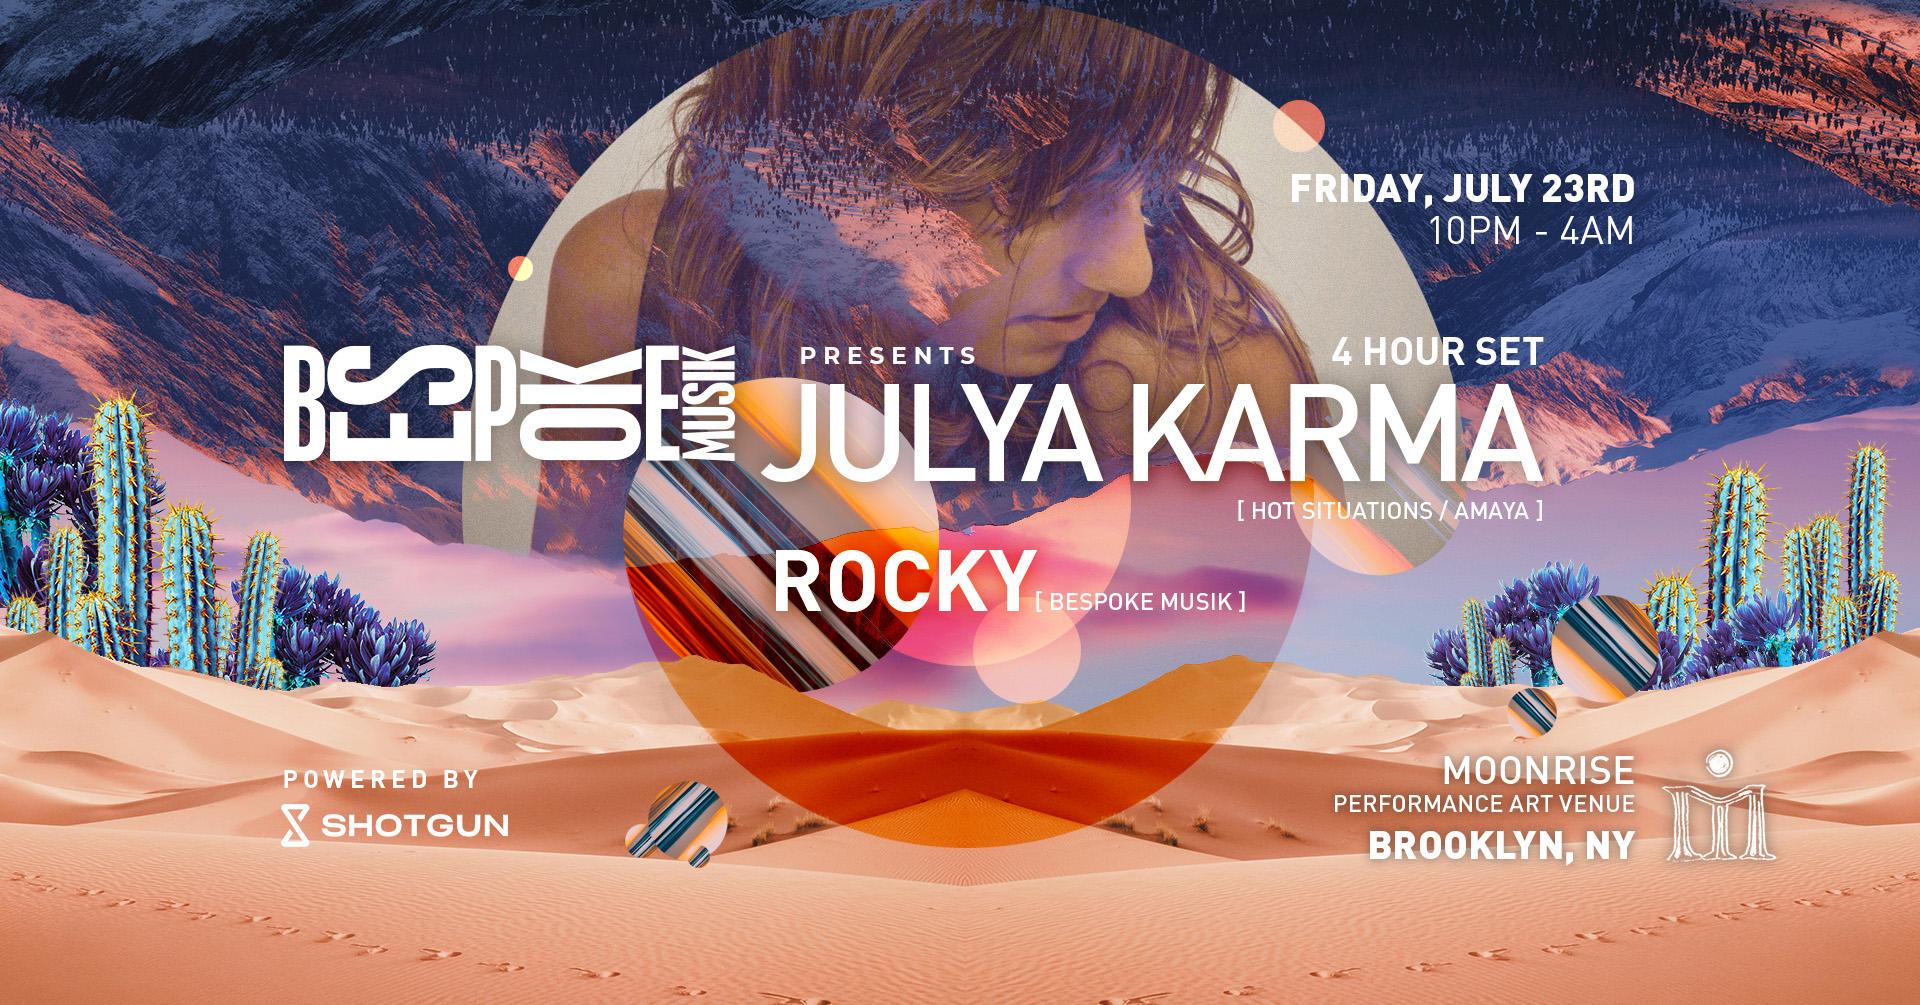 Bespoke Musik Presents Julya Karma [Hot Situations / Amaya]